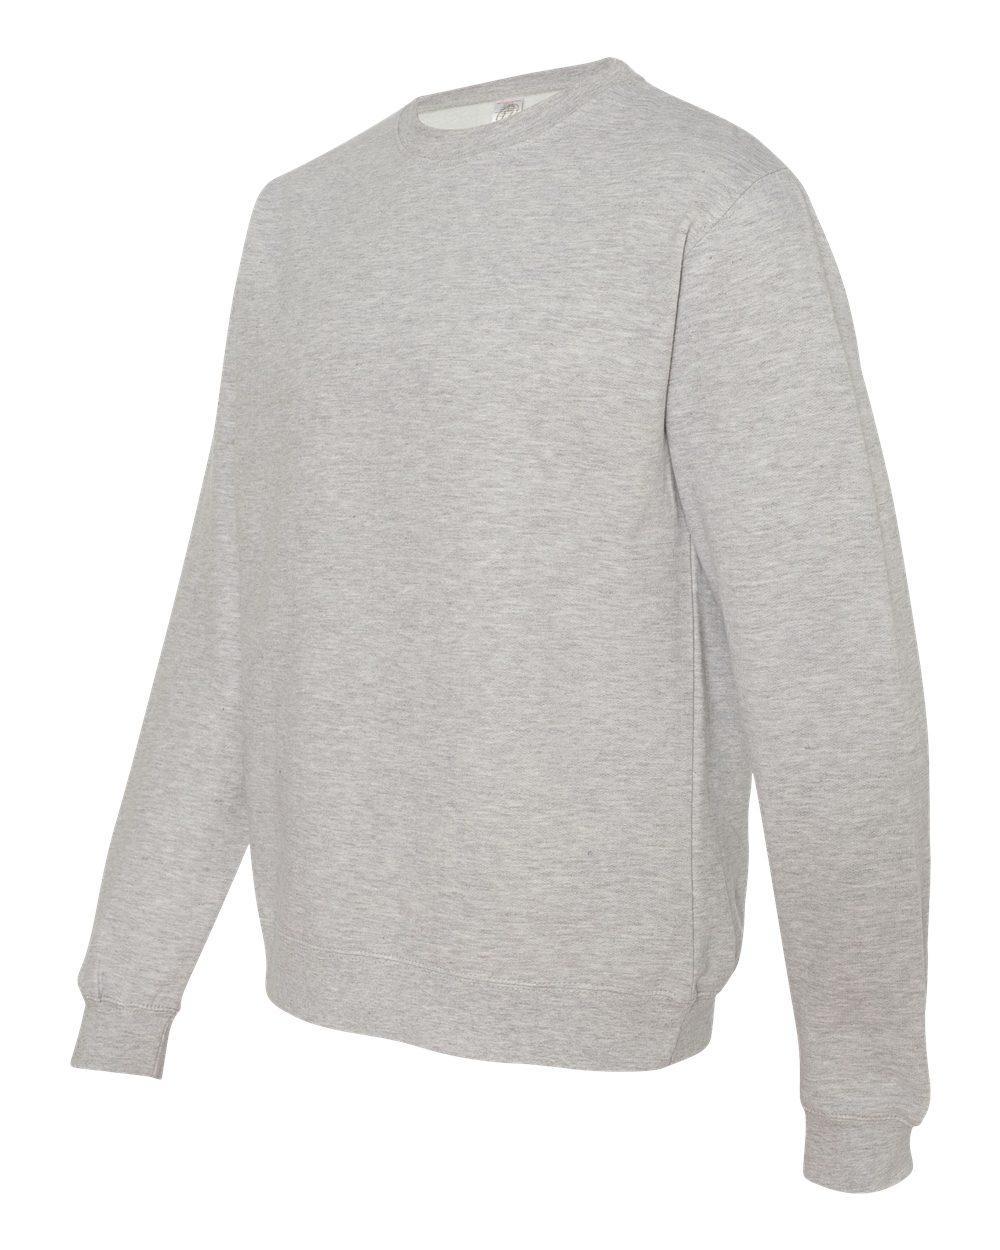 Independent Trading Co. Crewneck Sweatshirt - SS3000